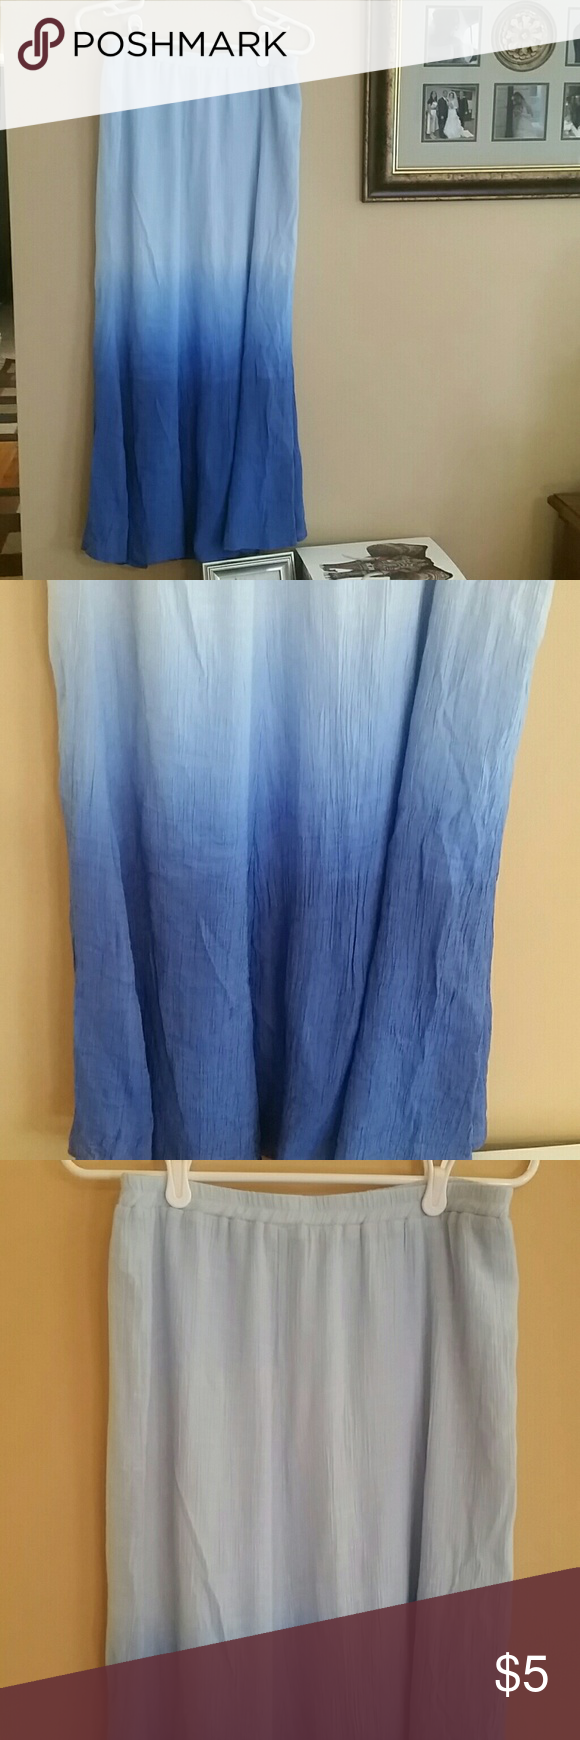 Light Weight Maxi Skirt Maxi skirt, Maxi, Gradient color